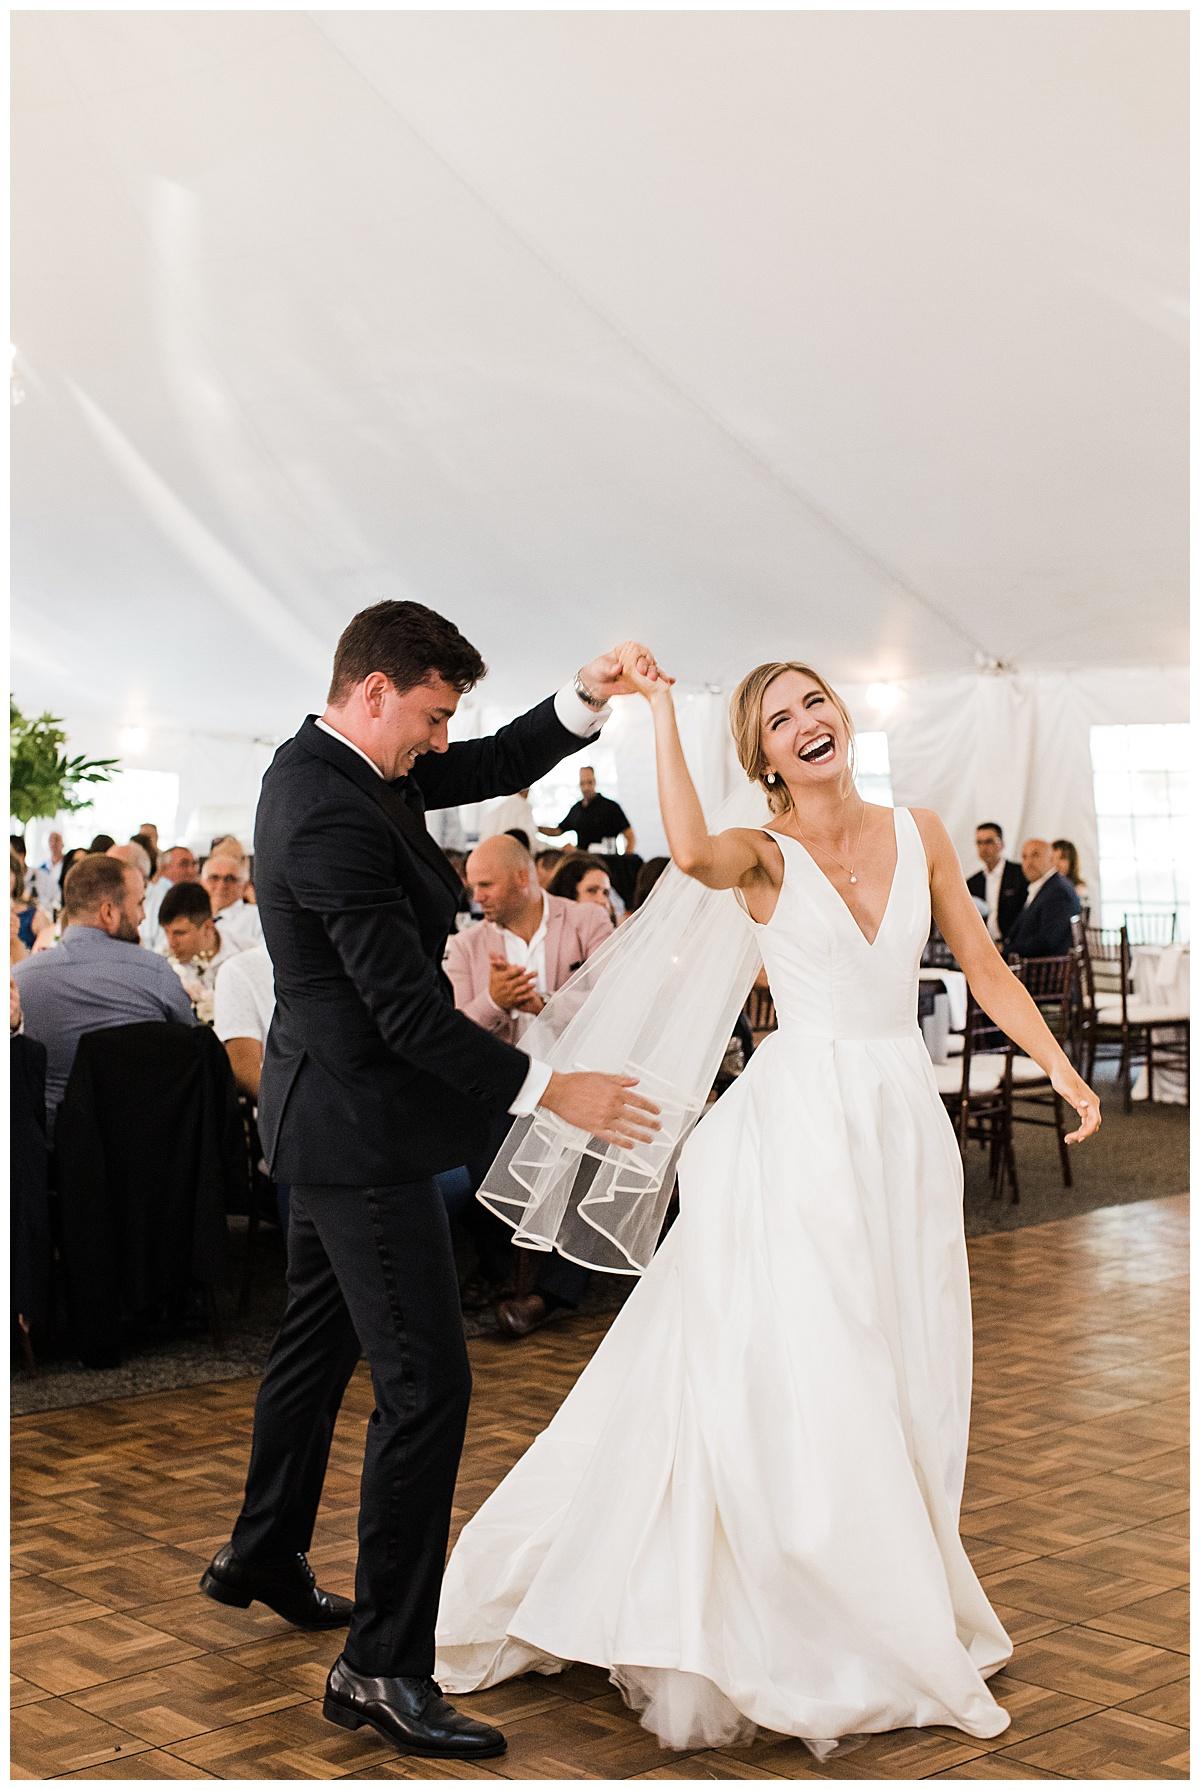 Bride and groom dancing and laughing on dance floor|Georgetown,  Ontario wedding| Toronto wedding photographer| 3photography